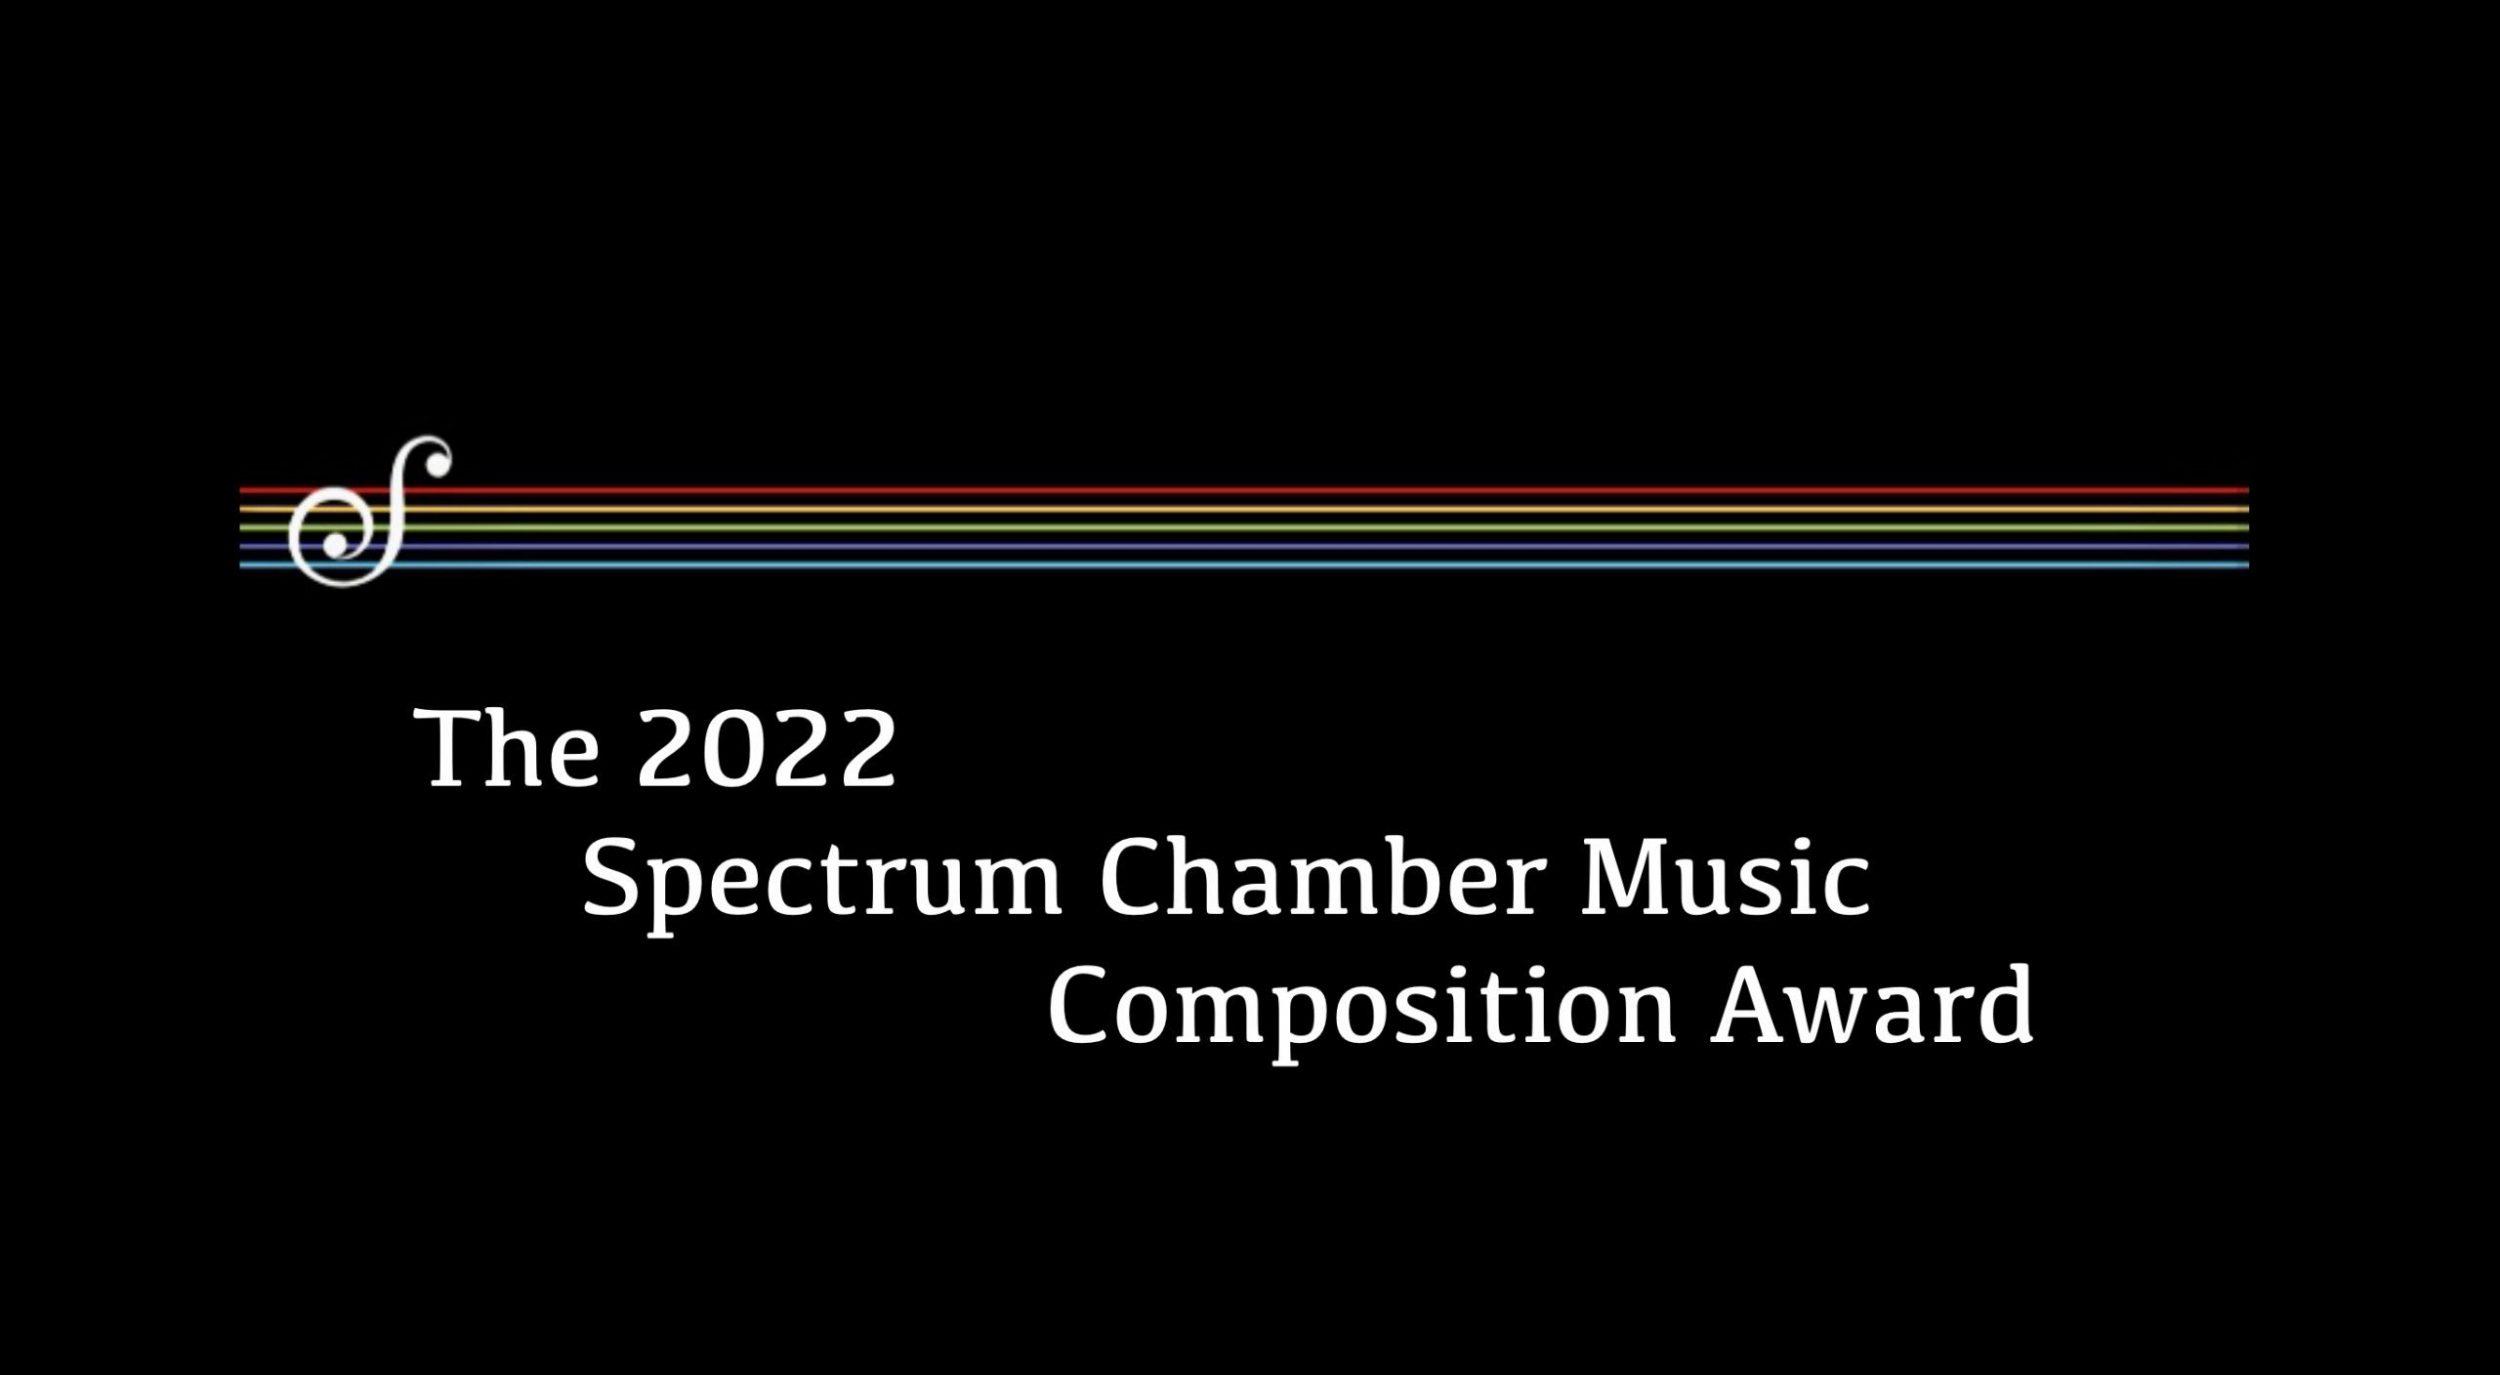 2022 Spectrum Chamber Music Composition Award